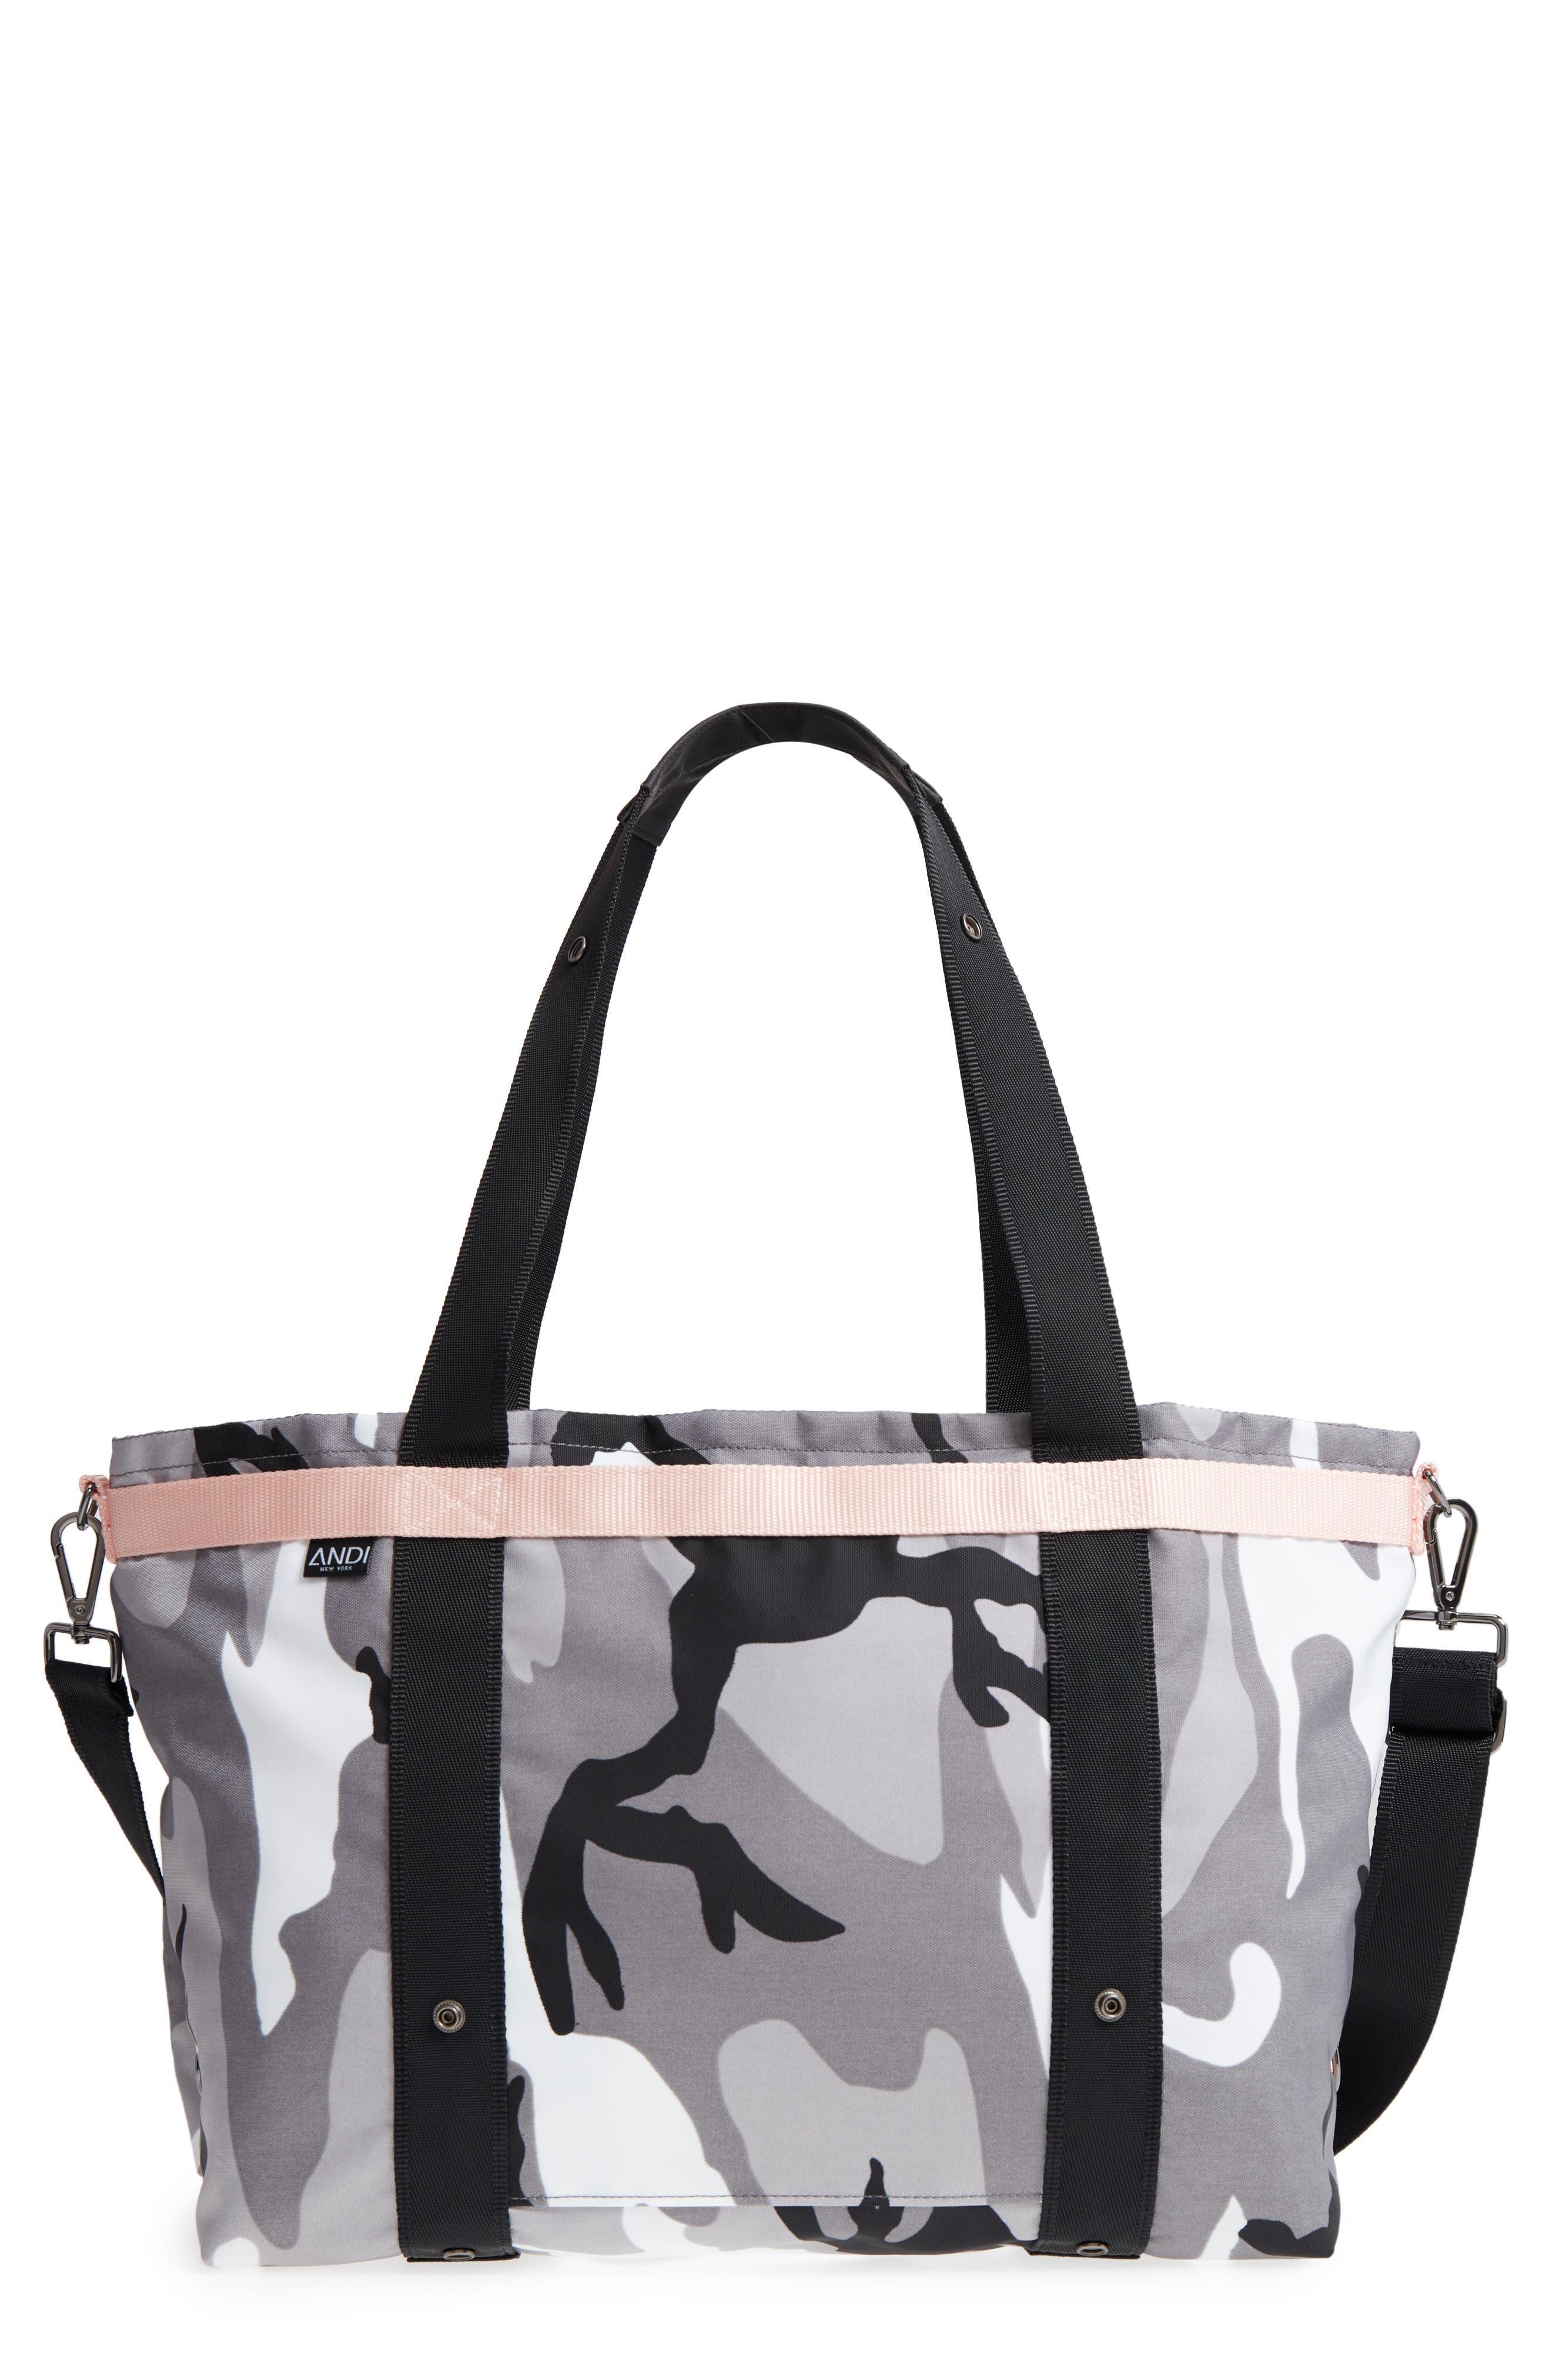 ANDI Camo Convertible Tote - Grey in Black/ White/ Gray/ Pink